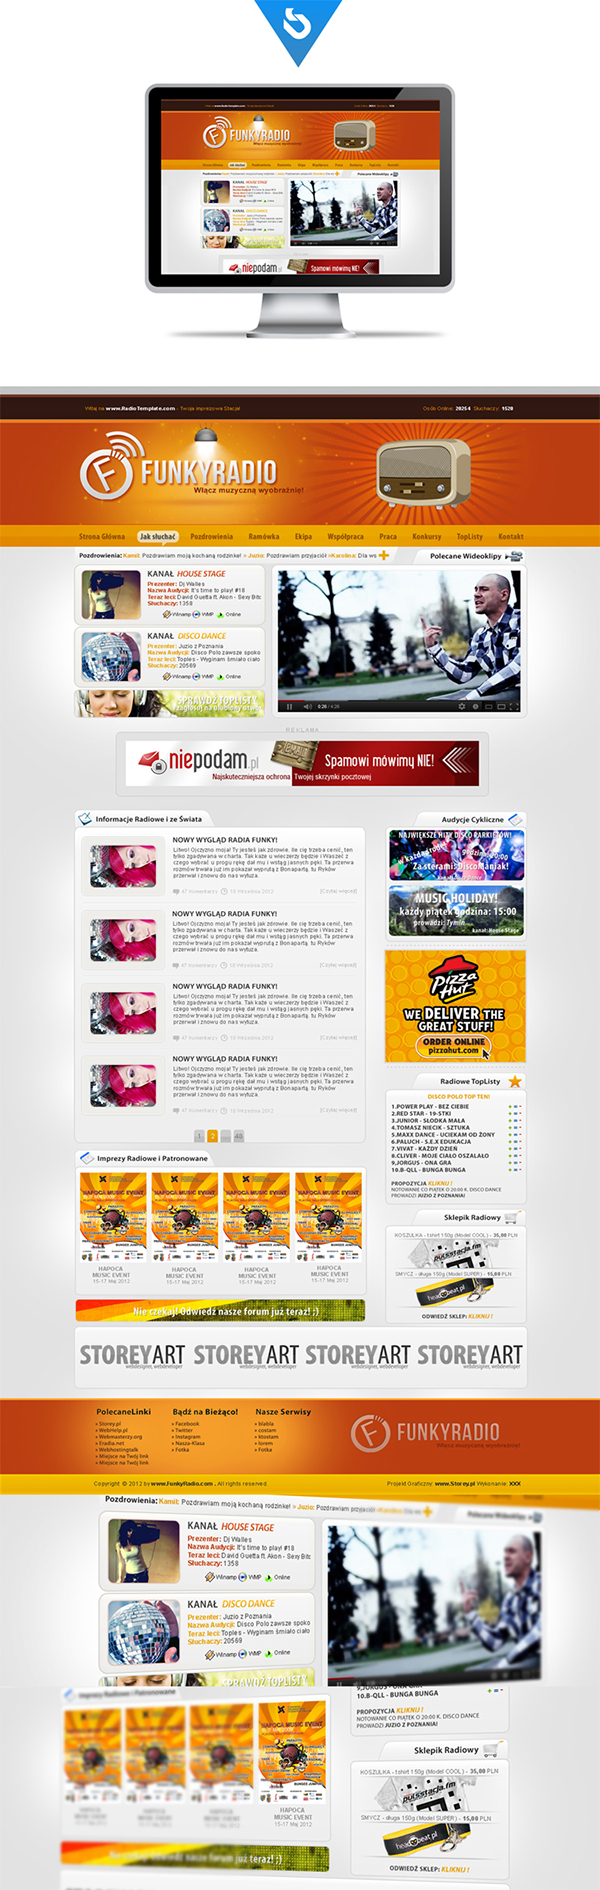 storey.pl  storeypl  radio internetowe layout dla radia layout radio internetowe projekt dla radia